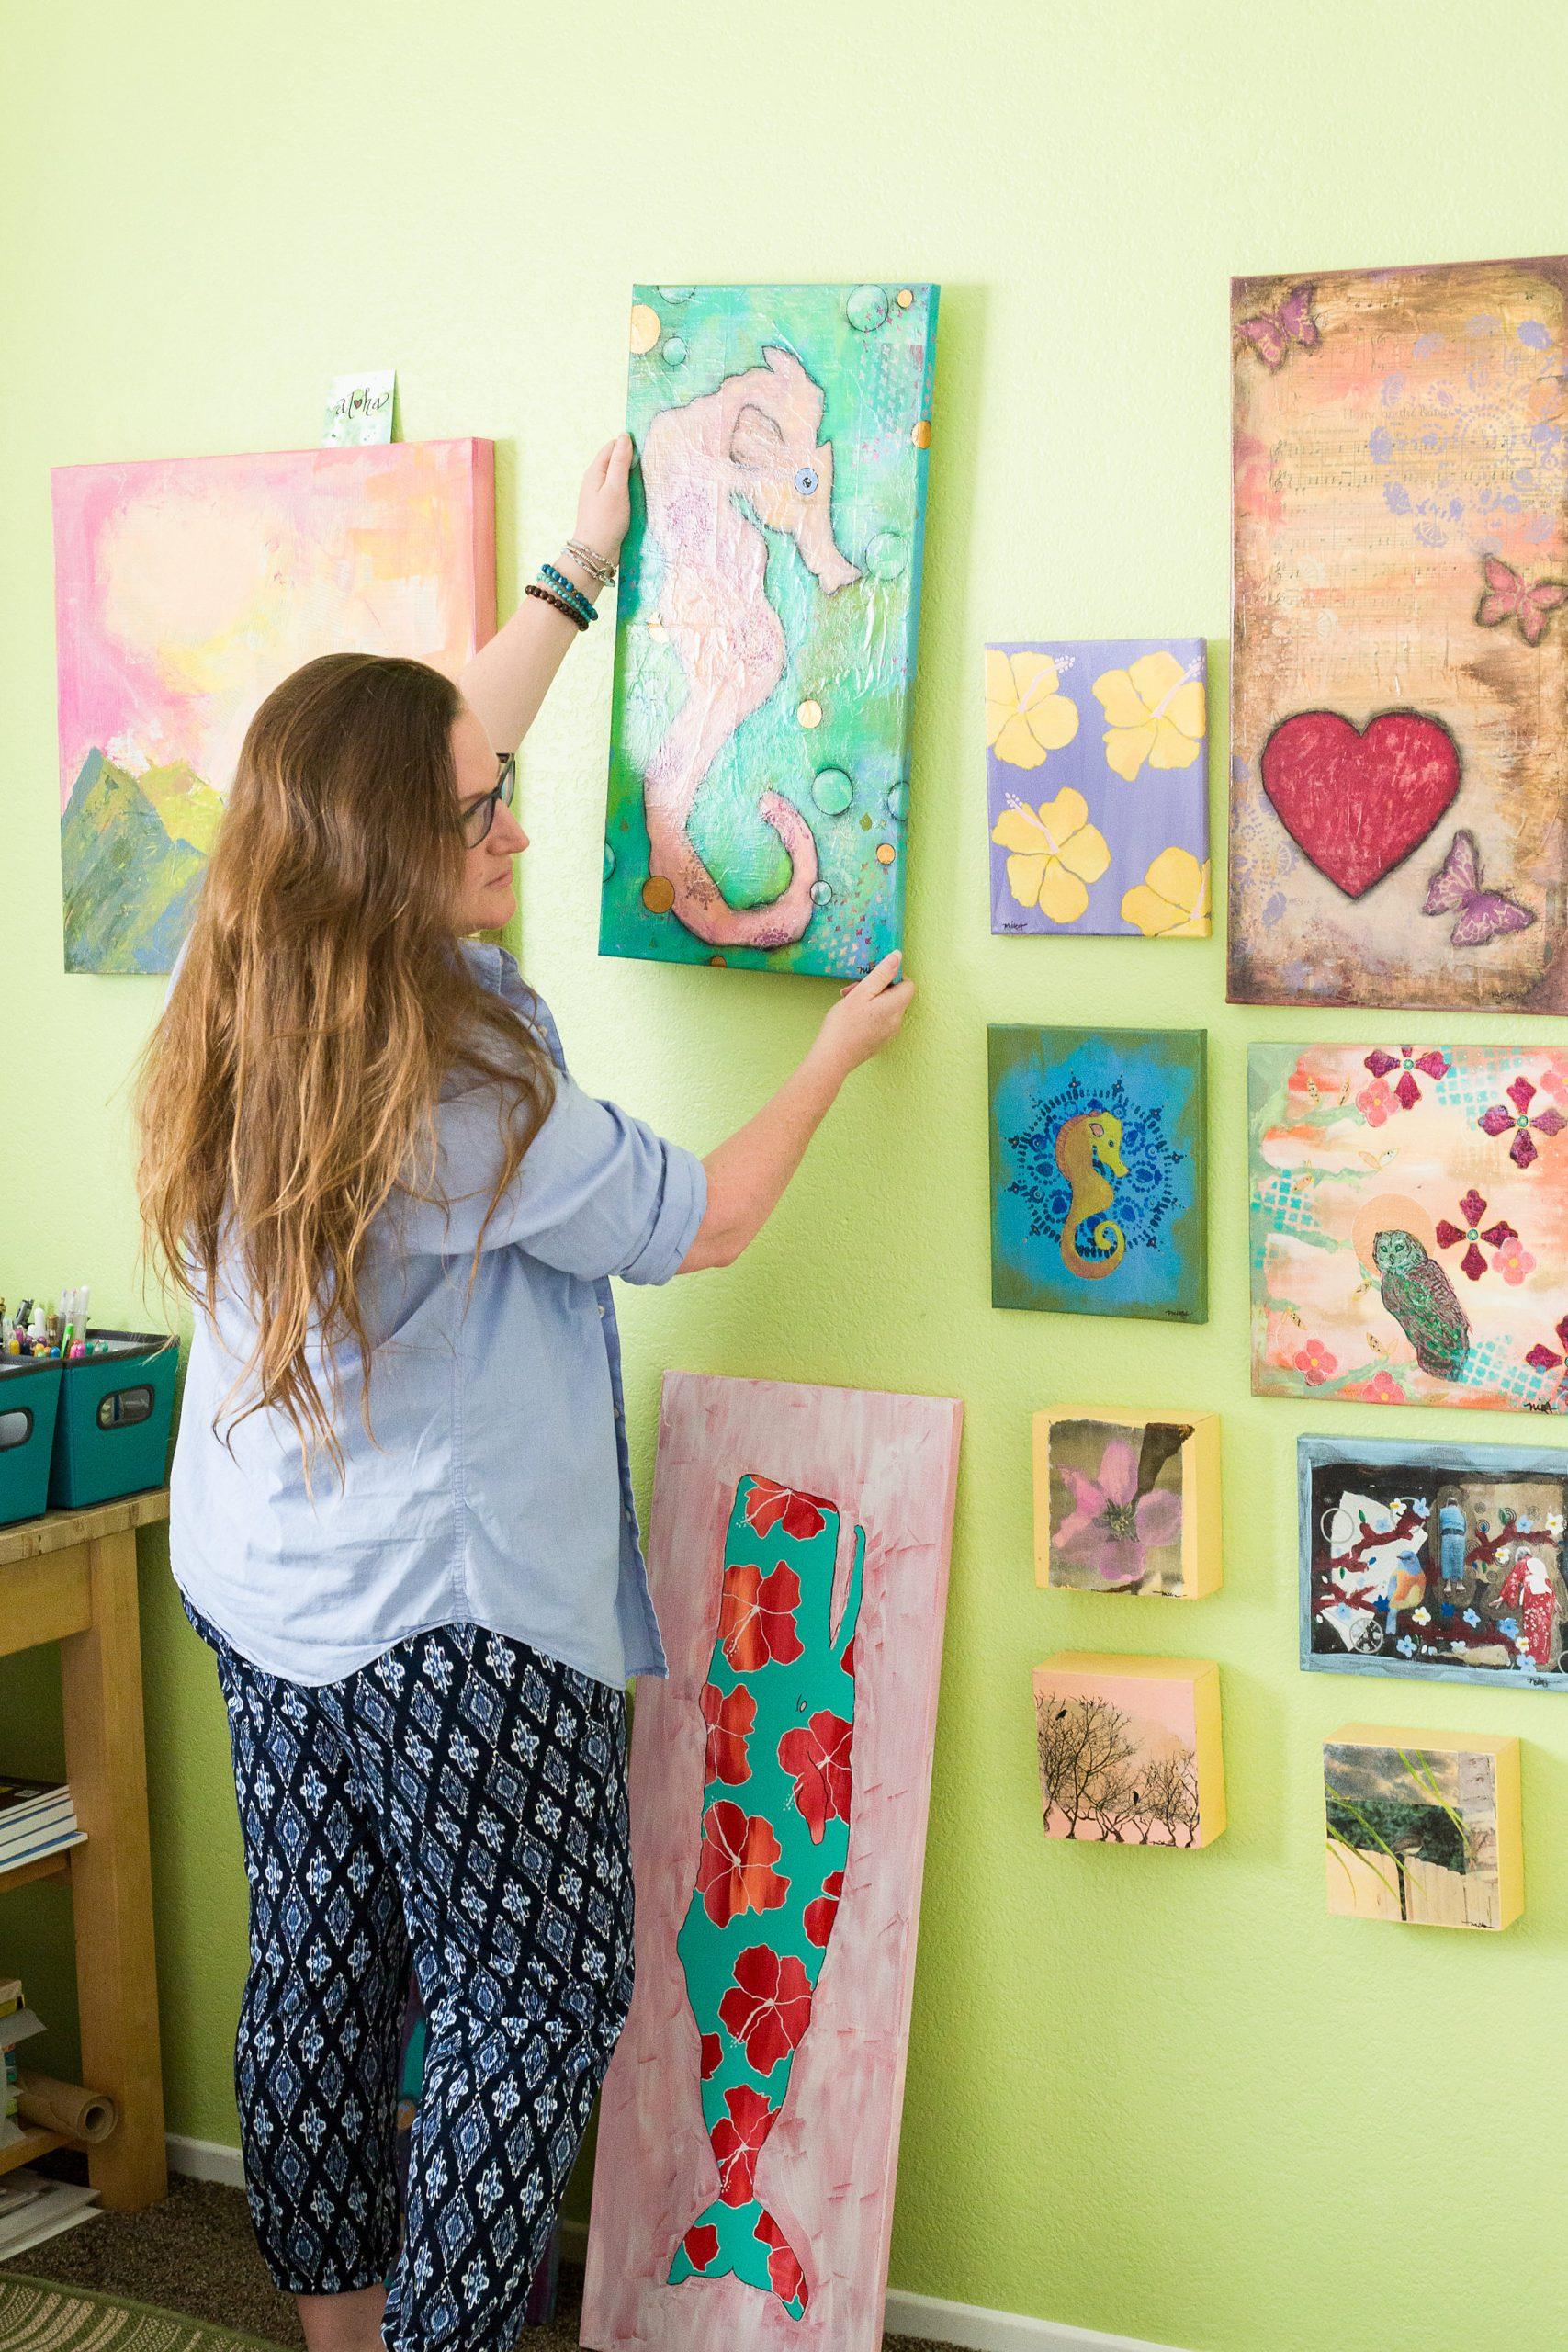 Tools of the Trade: Aloha Art Studio of Mika Harmony